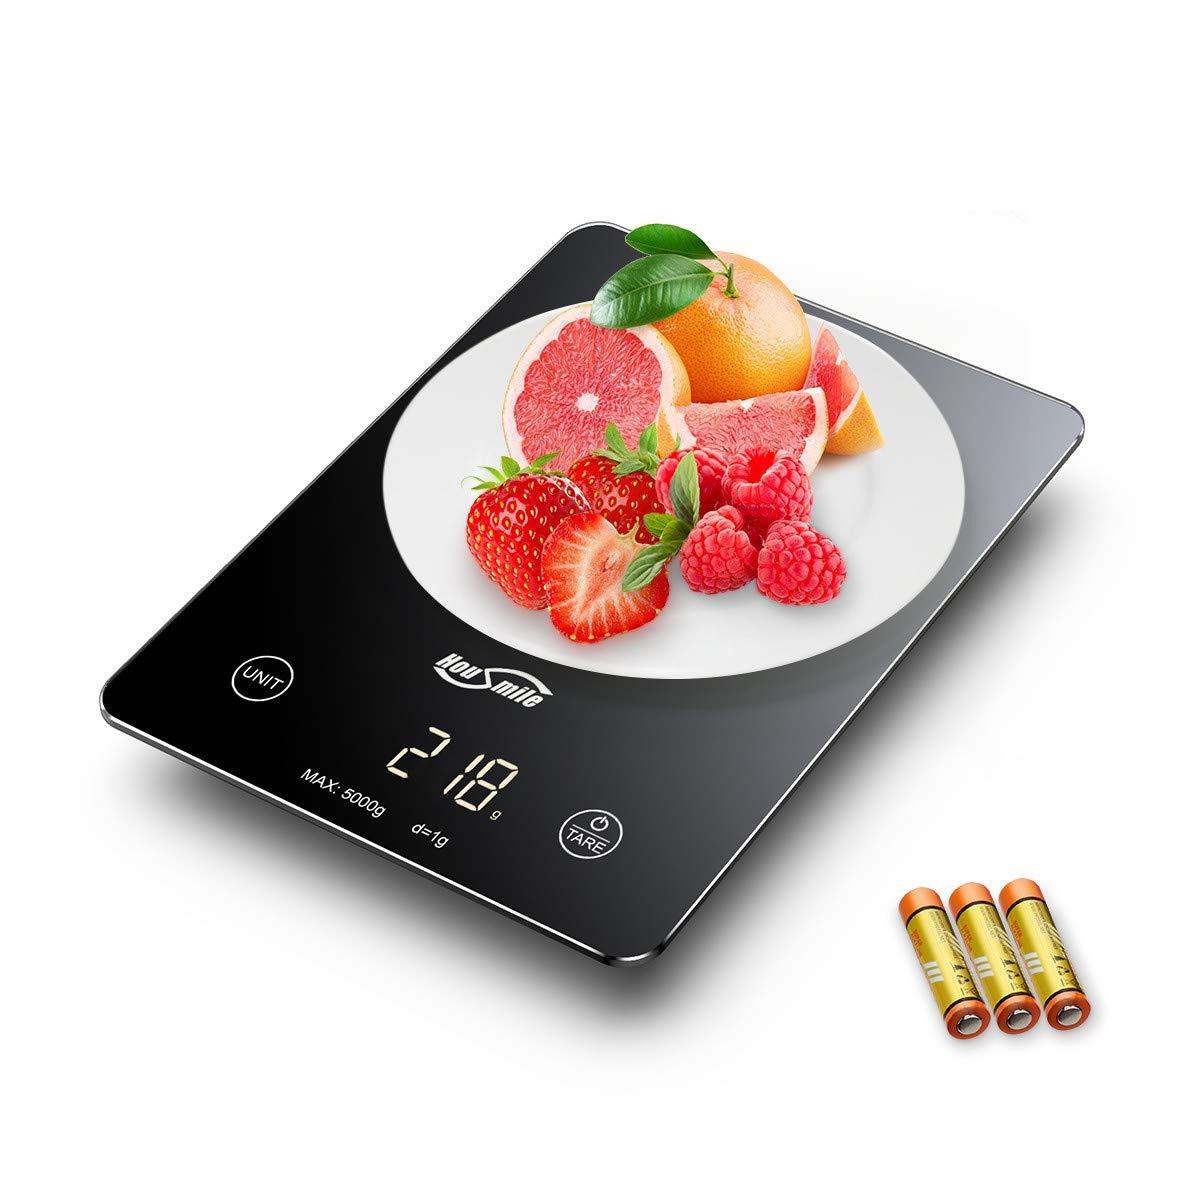 Housmile Báscula Digital de Cocina, Báscula Electrónica Táctil para Cocinar, Balanza de Alimentos Multifuncional, 5kg / 11 lbs, Incluyendo Pilas con Gran Pantalla de LED Color-Negro